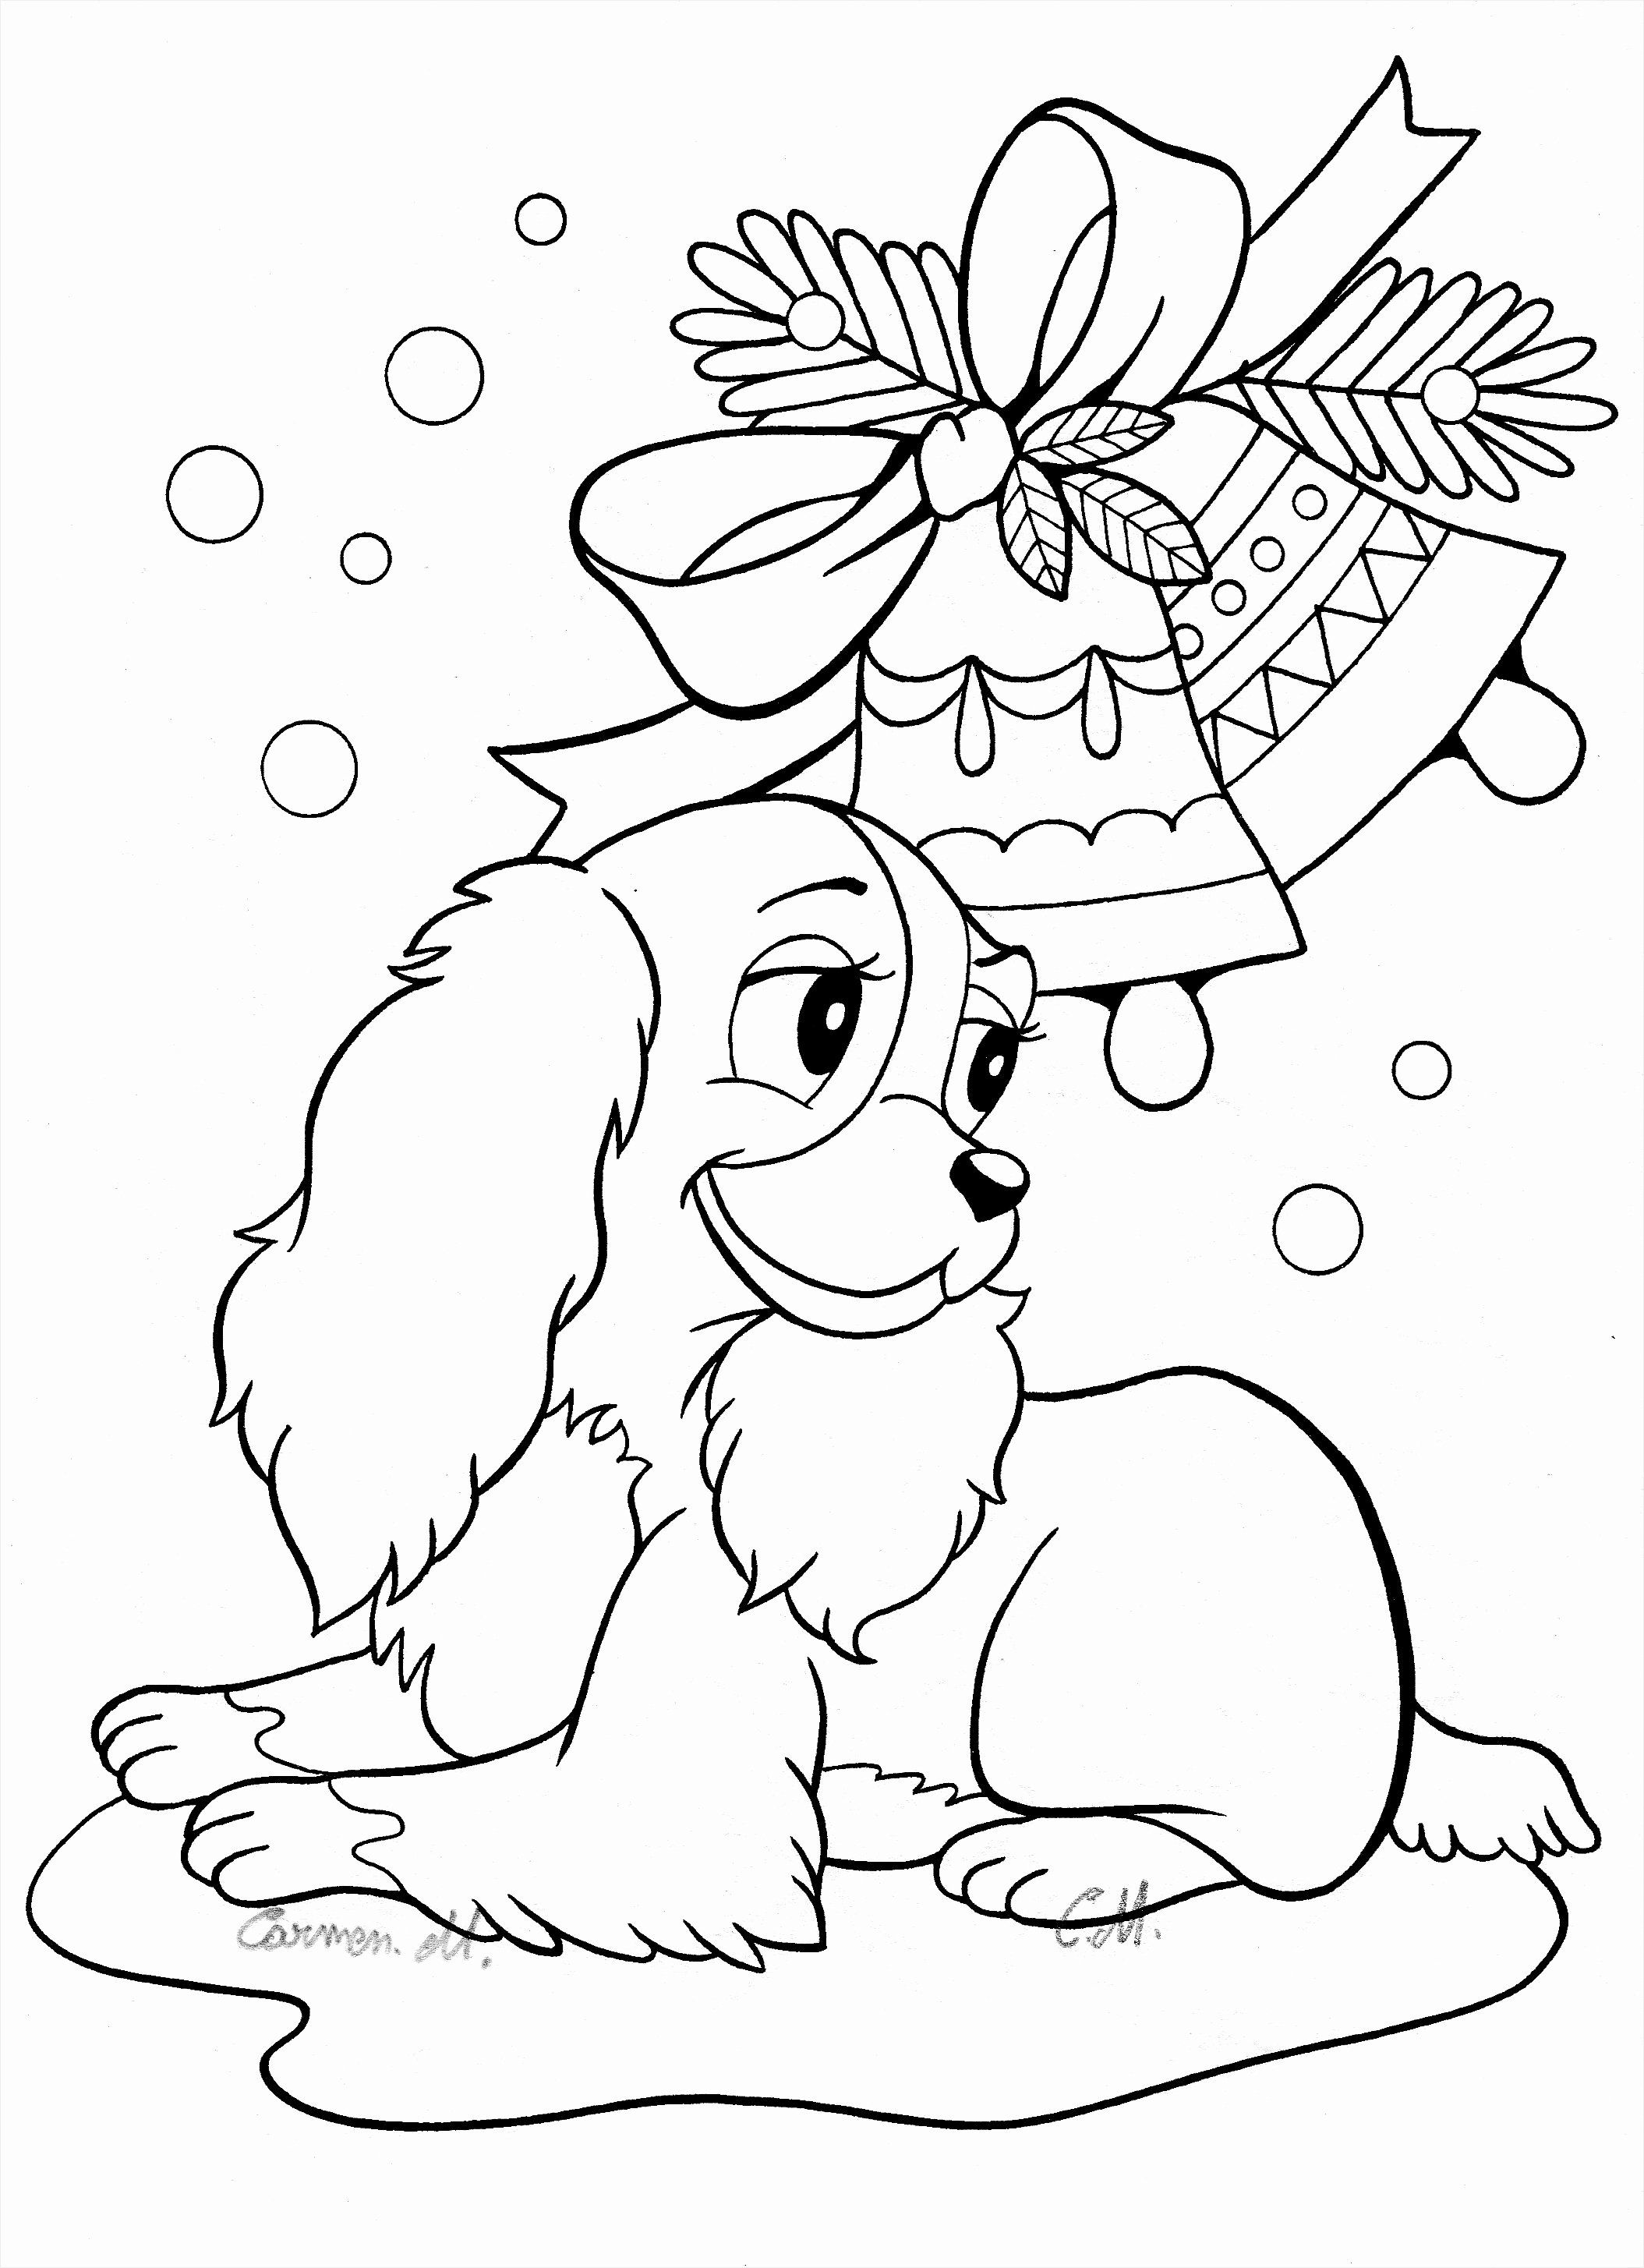 Pin By Julia Bilanovska On Art Printable Christmas Coloring Pages Mermaid Coloring Pages Disney Coloring Pages